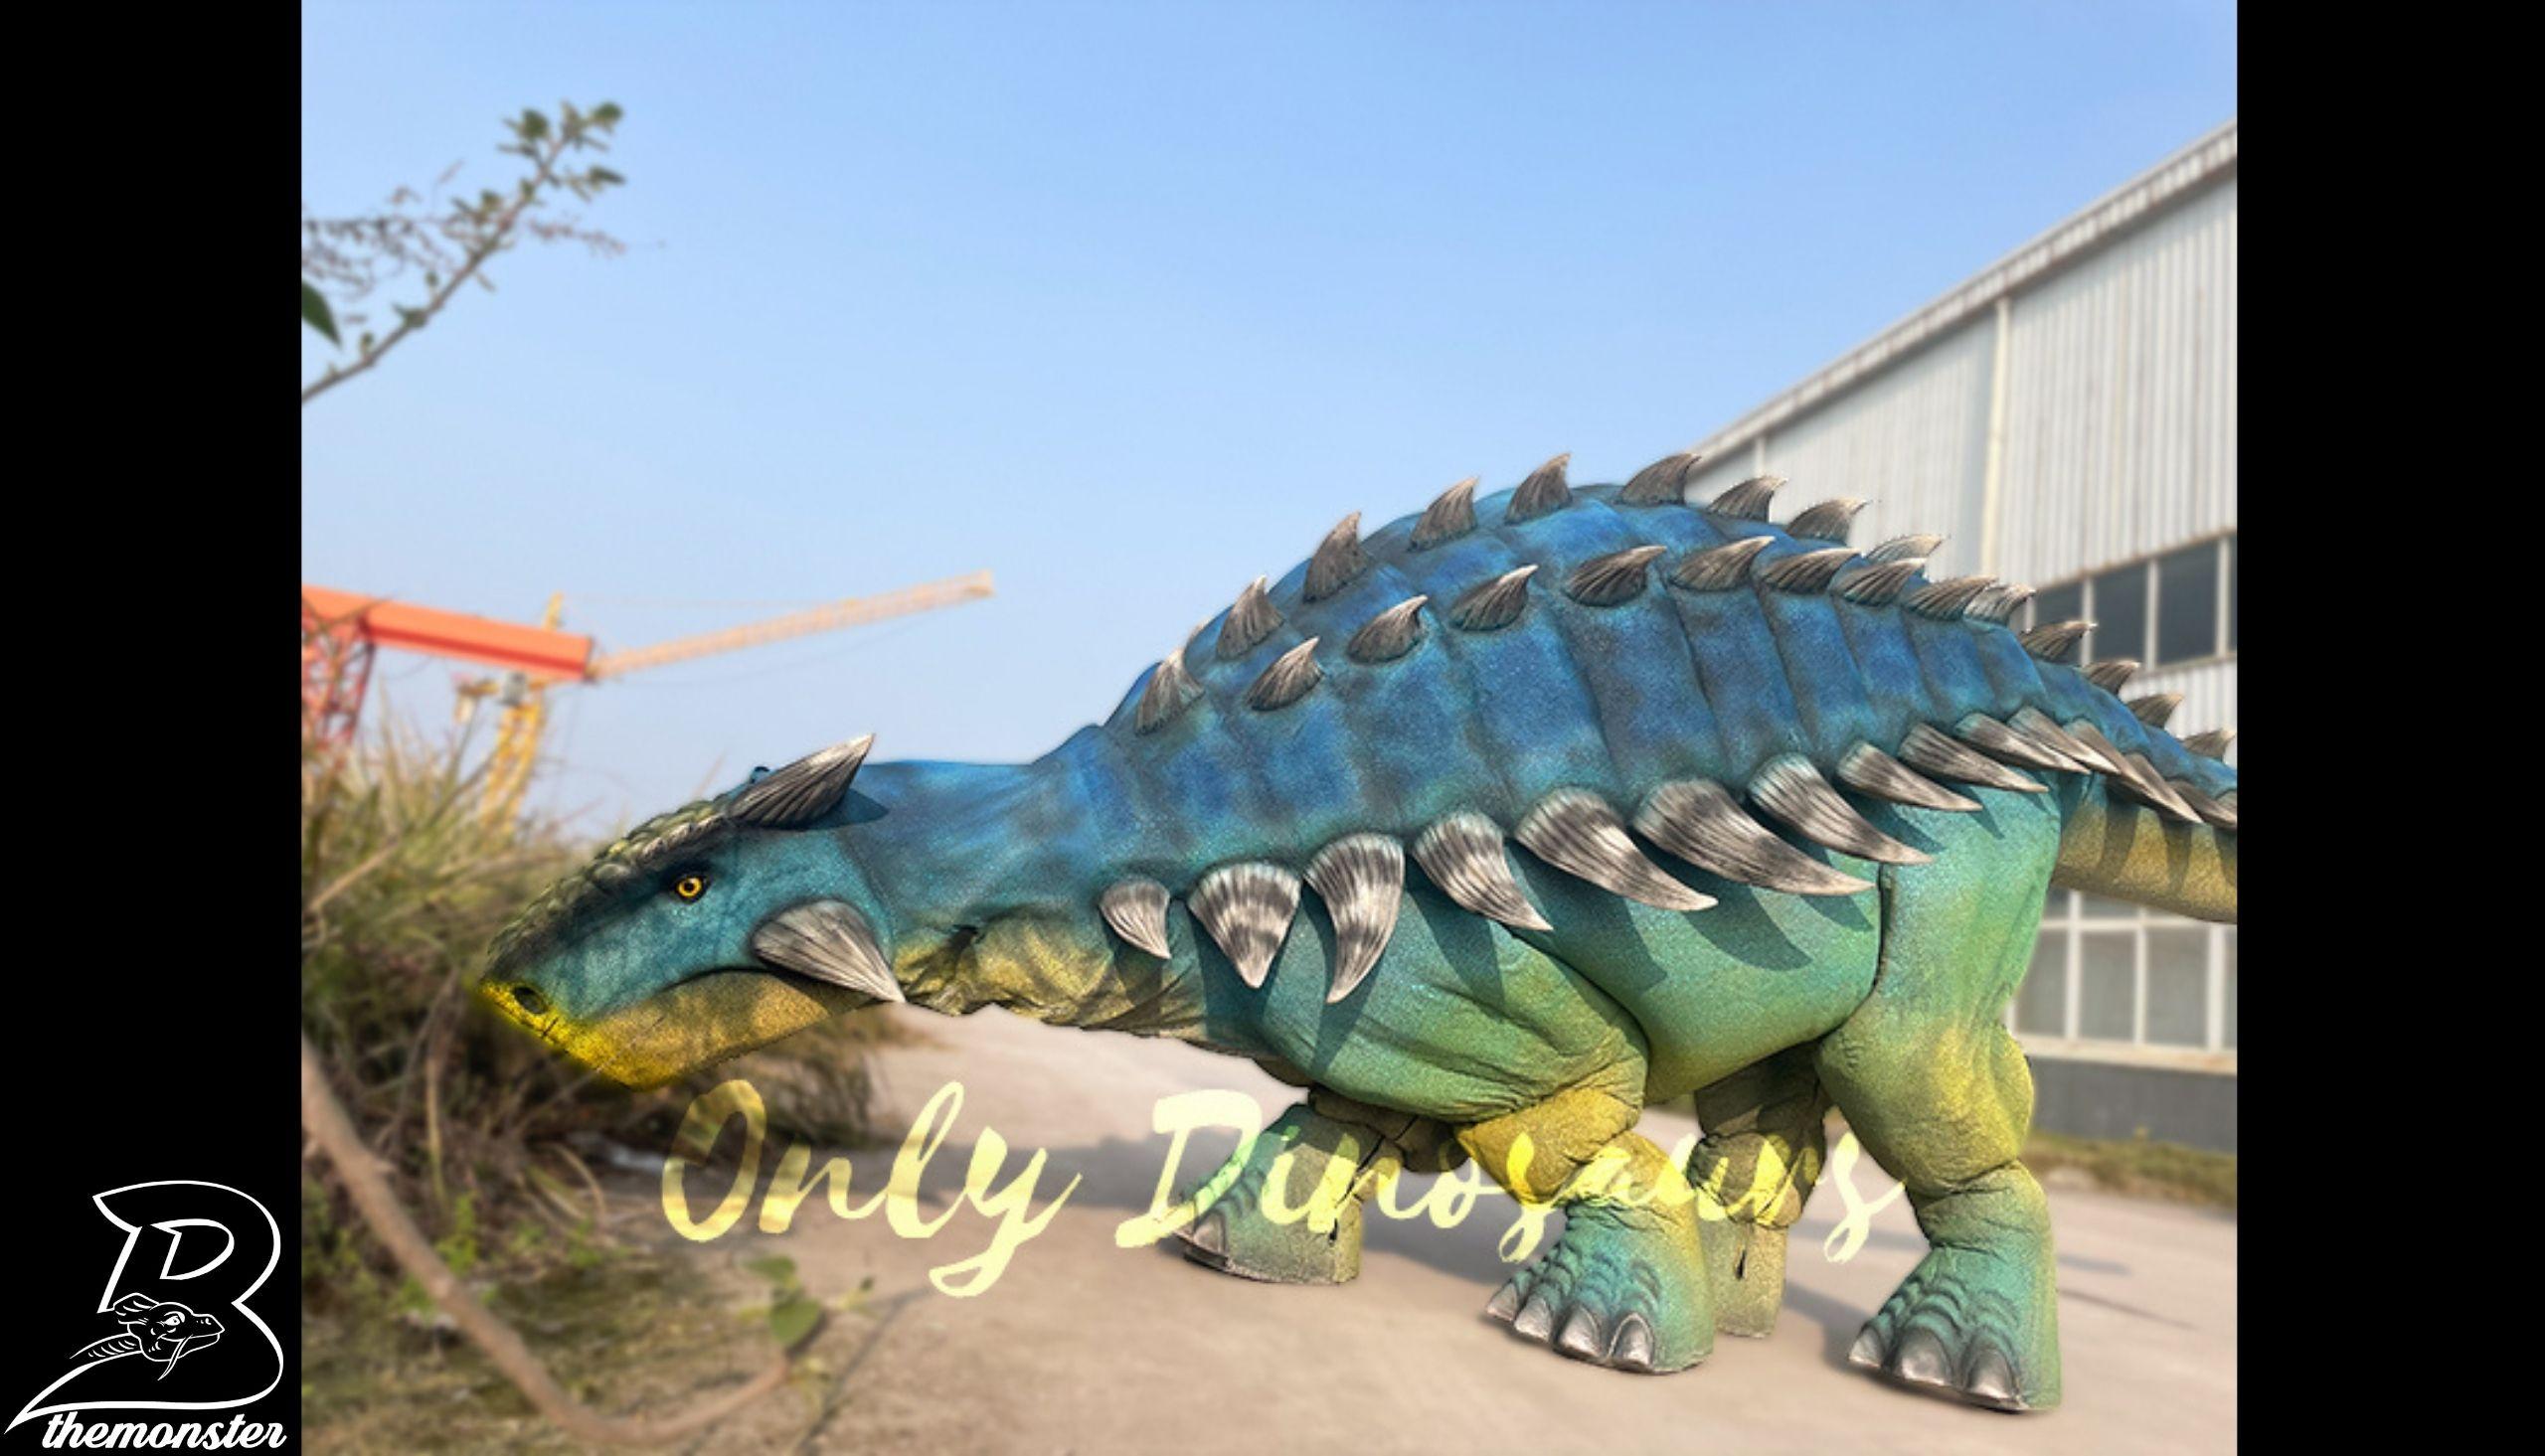 Vivid Ankylosaur Blue Controlled By two Person Dinosaur Costume in vendita sul Bthemonster.com